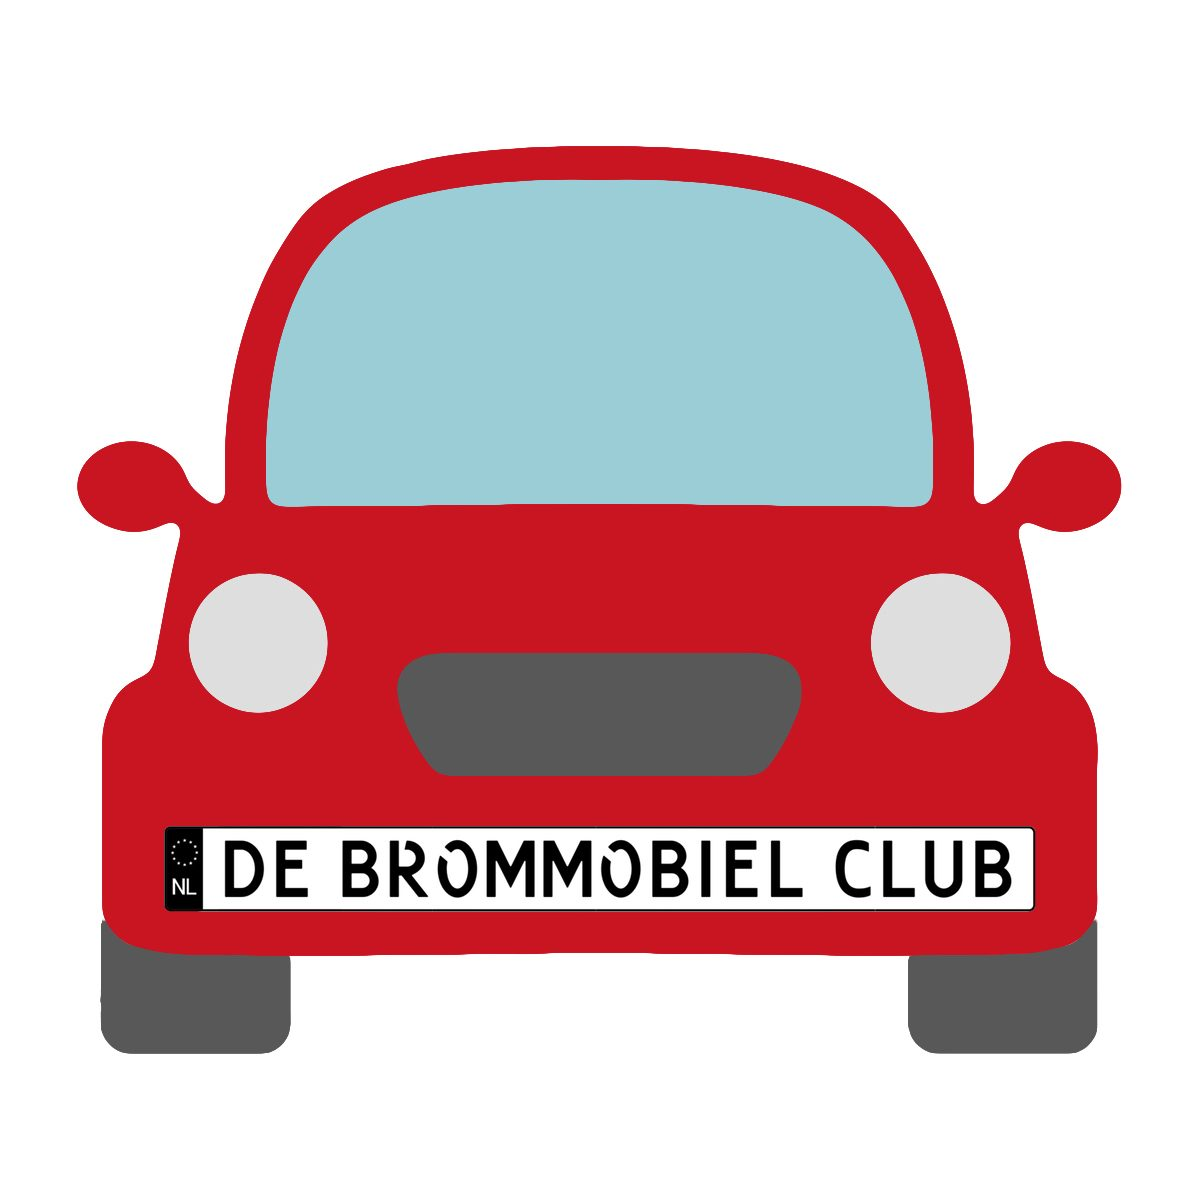 De Brommobiel Club